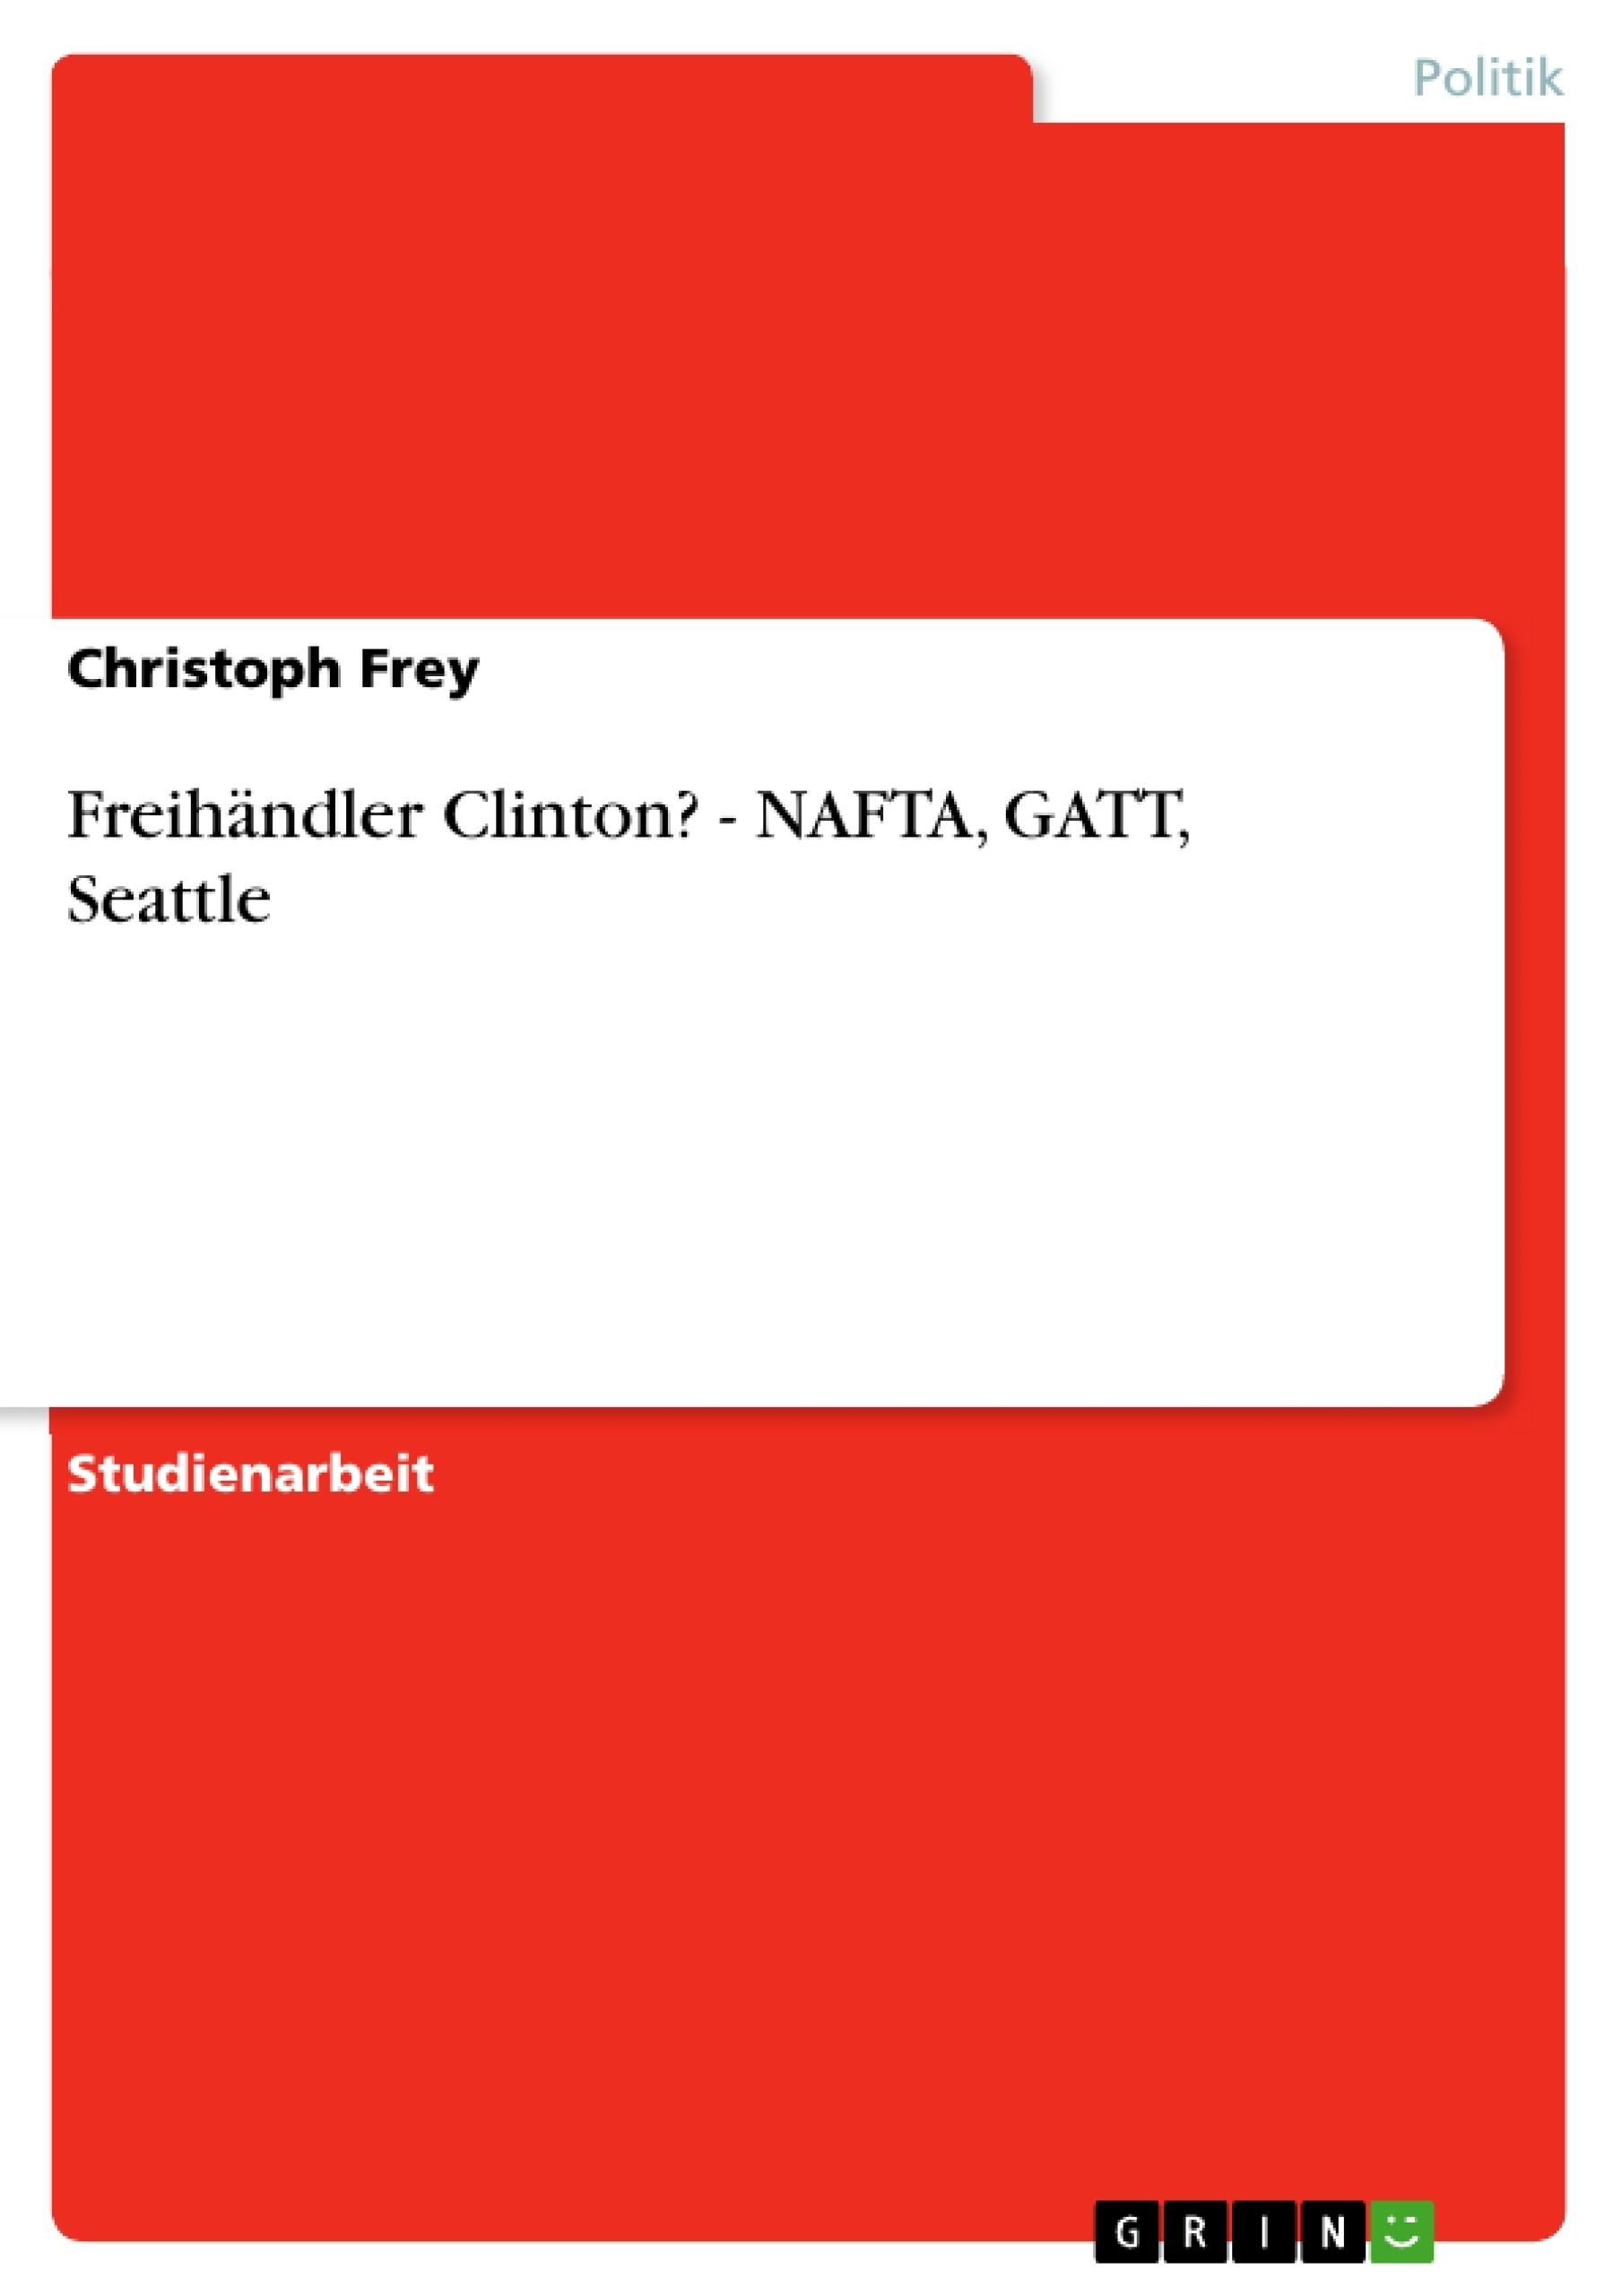 Titel: Freihändler Clinton? - NAFTA, GATT, Seattle